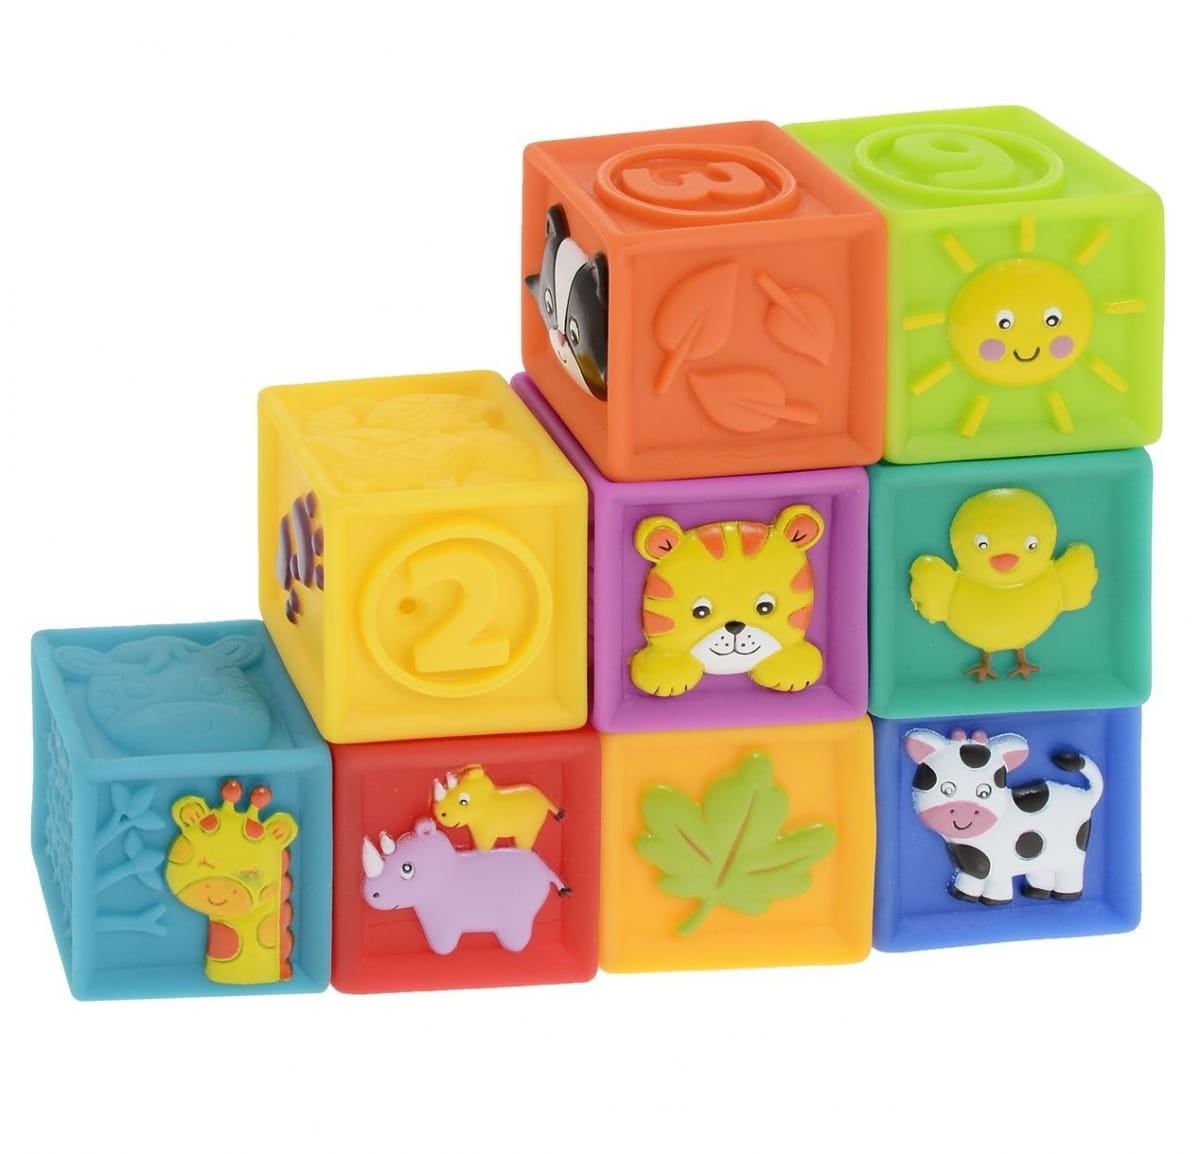 Мягкие кубики LITTLE HERO - Развивающие центры и игрушки